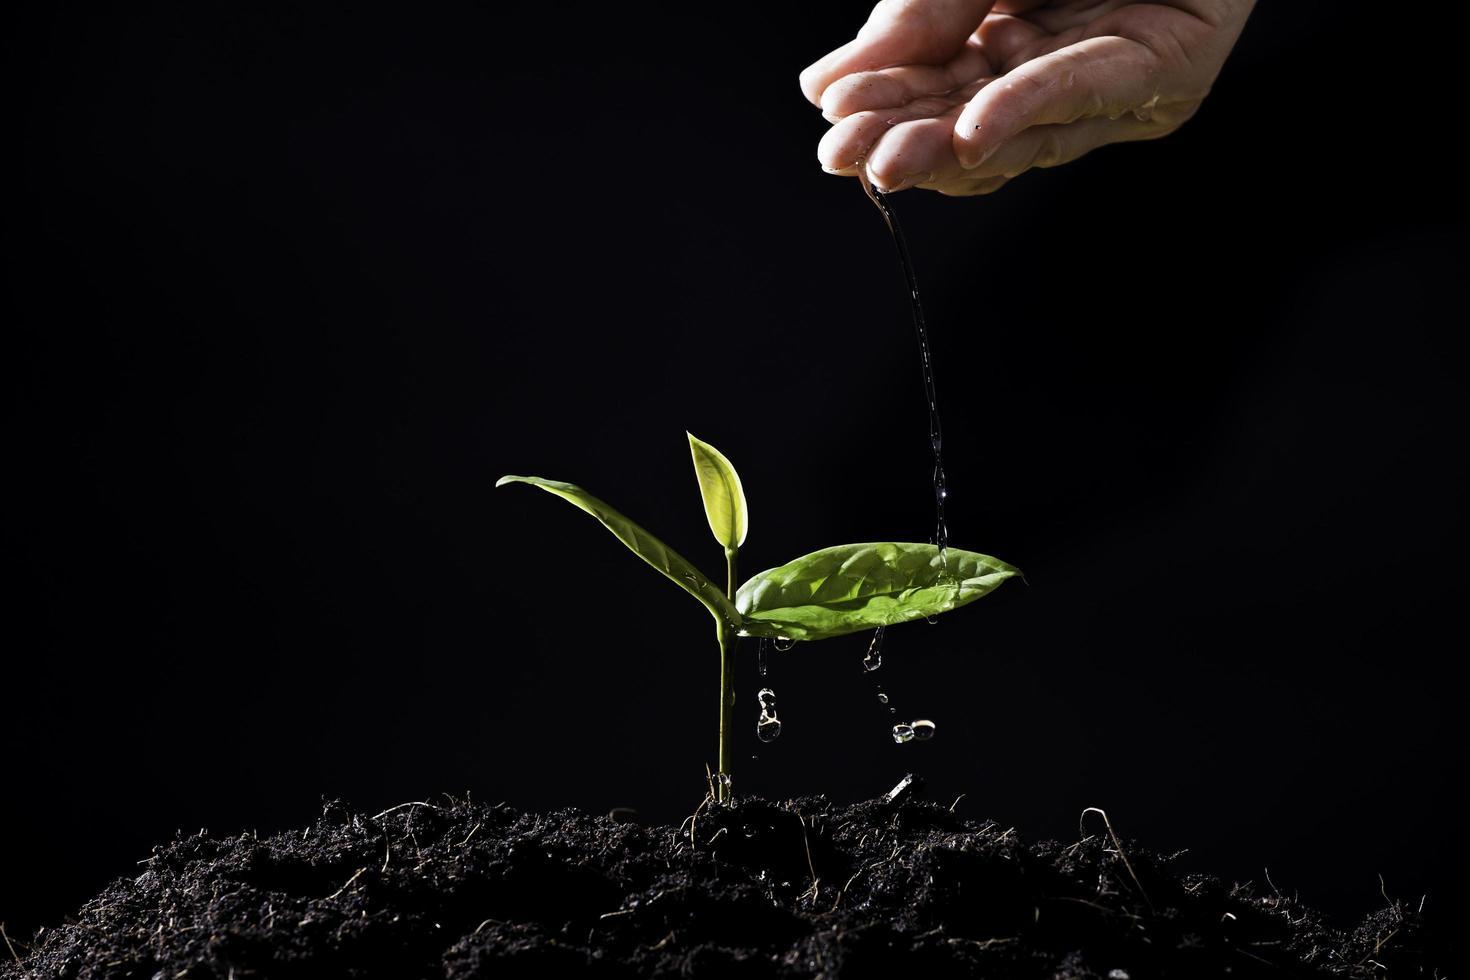 Farmers hand waters seedlings on black background photo